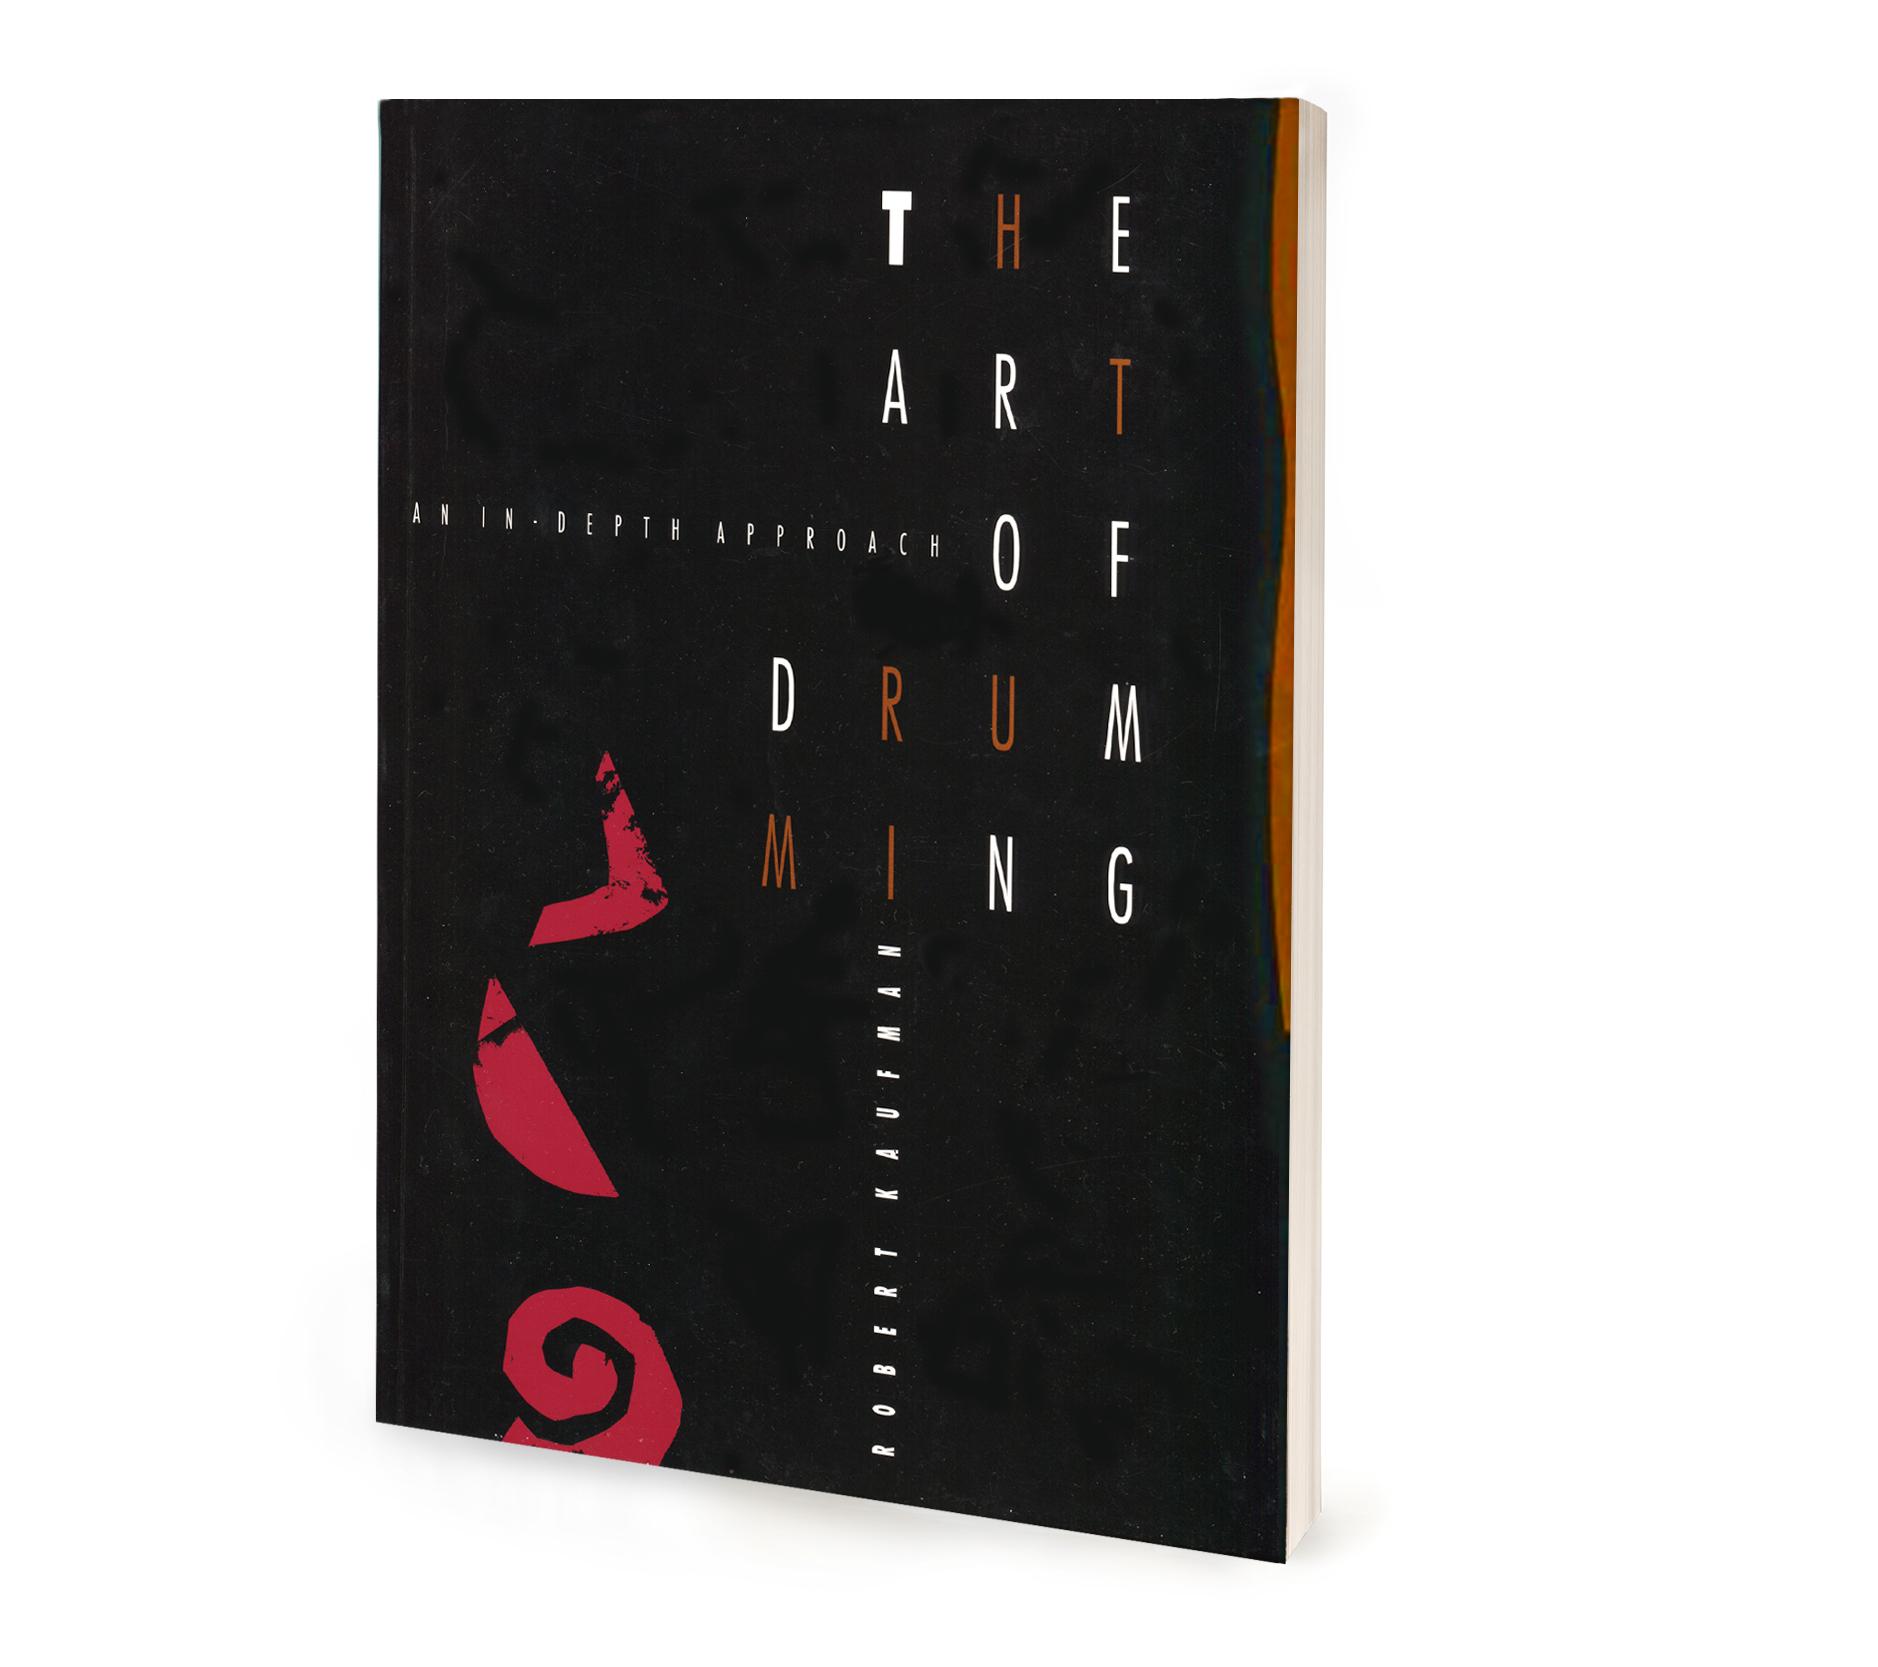 TheArtofDrumming_book1.jpg